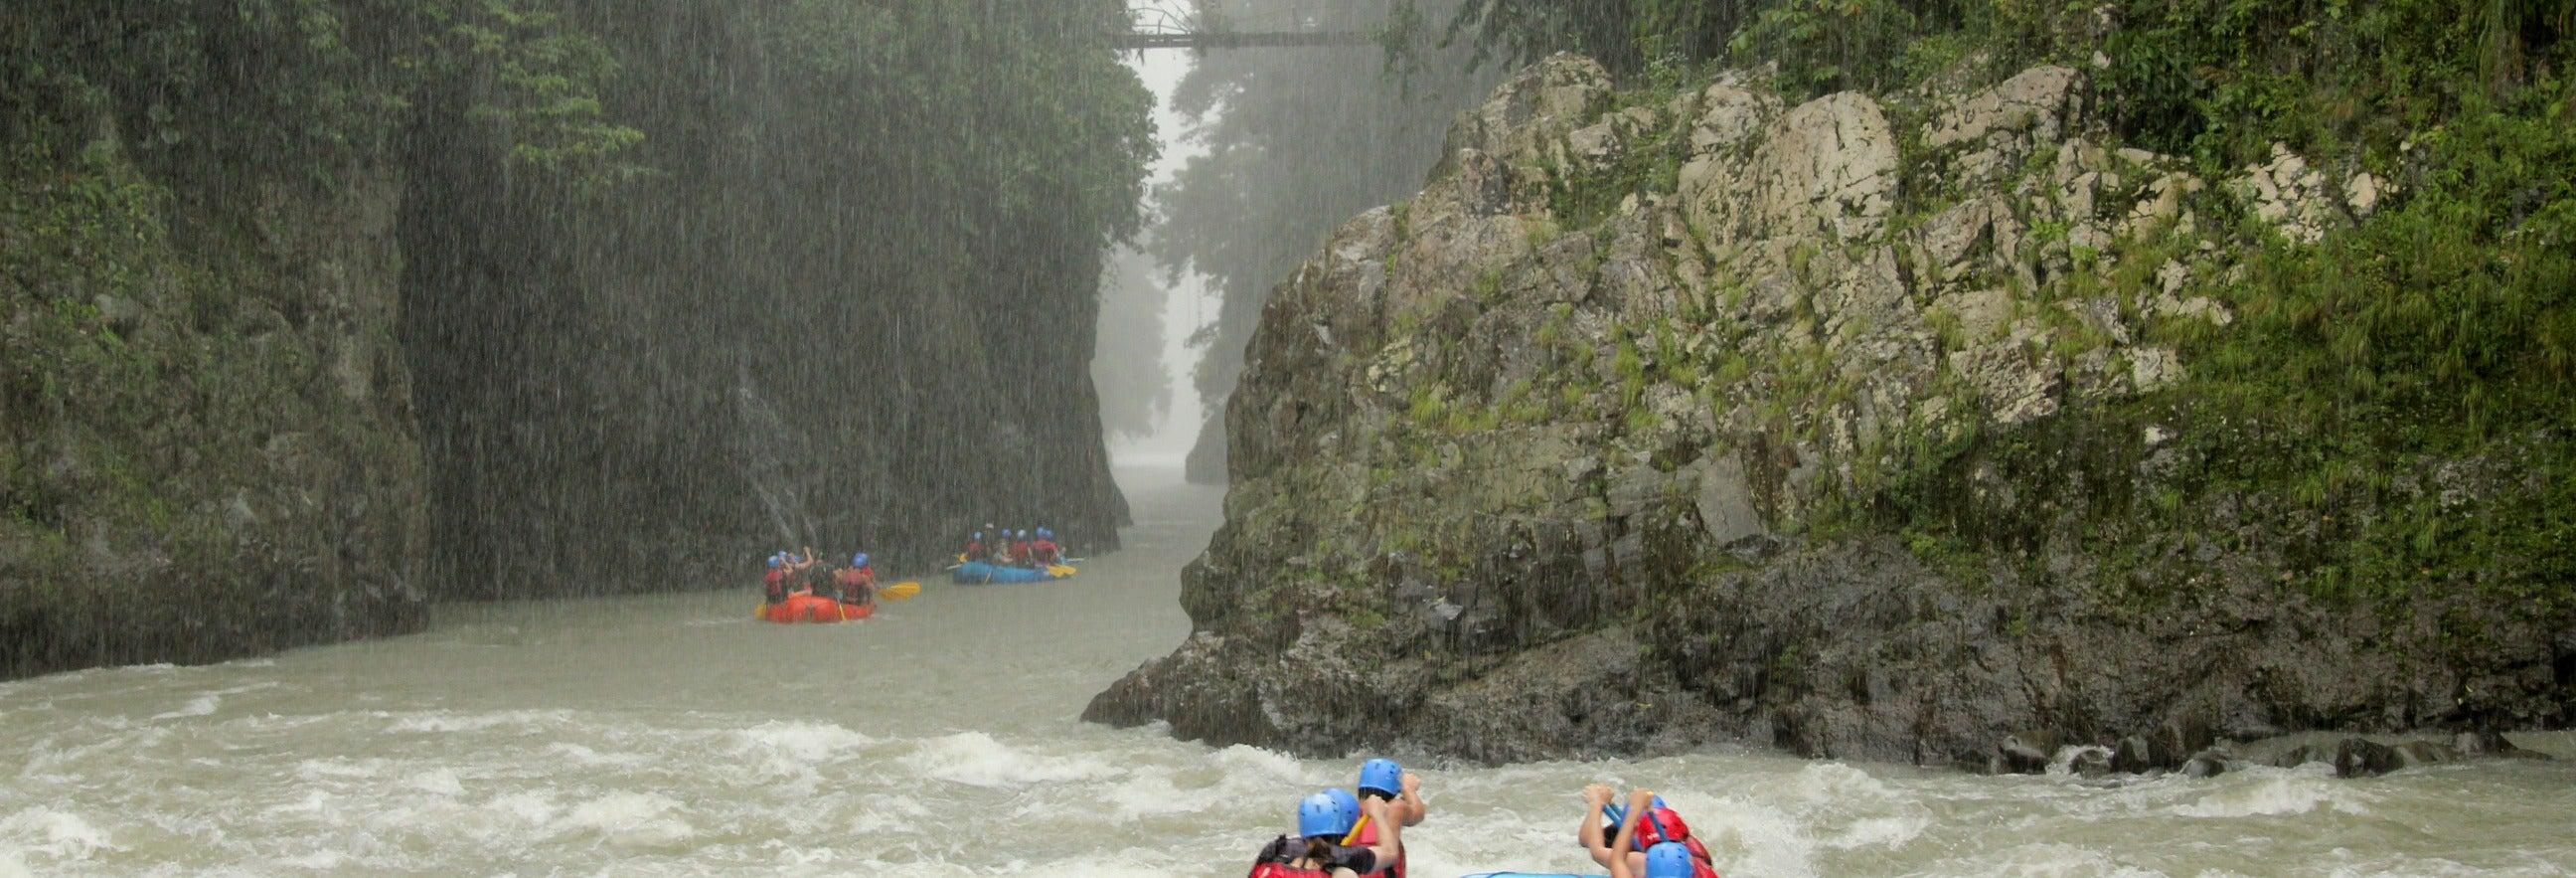 Rafting no rio Pacuare